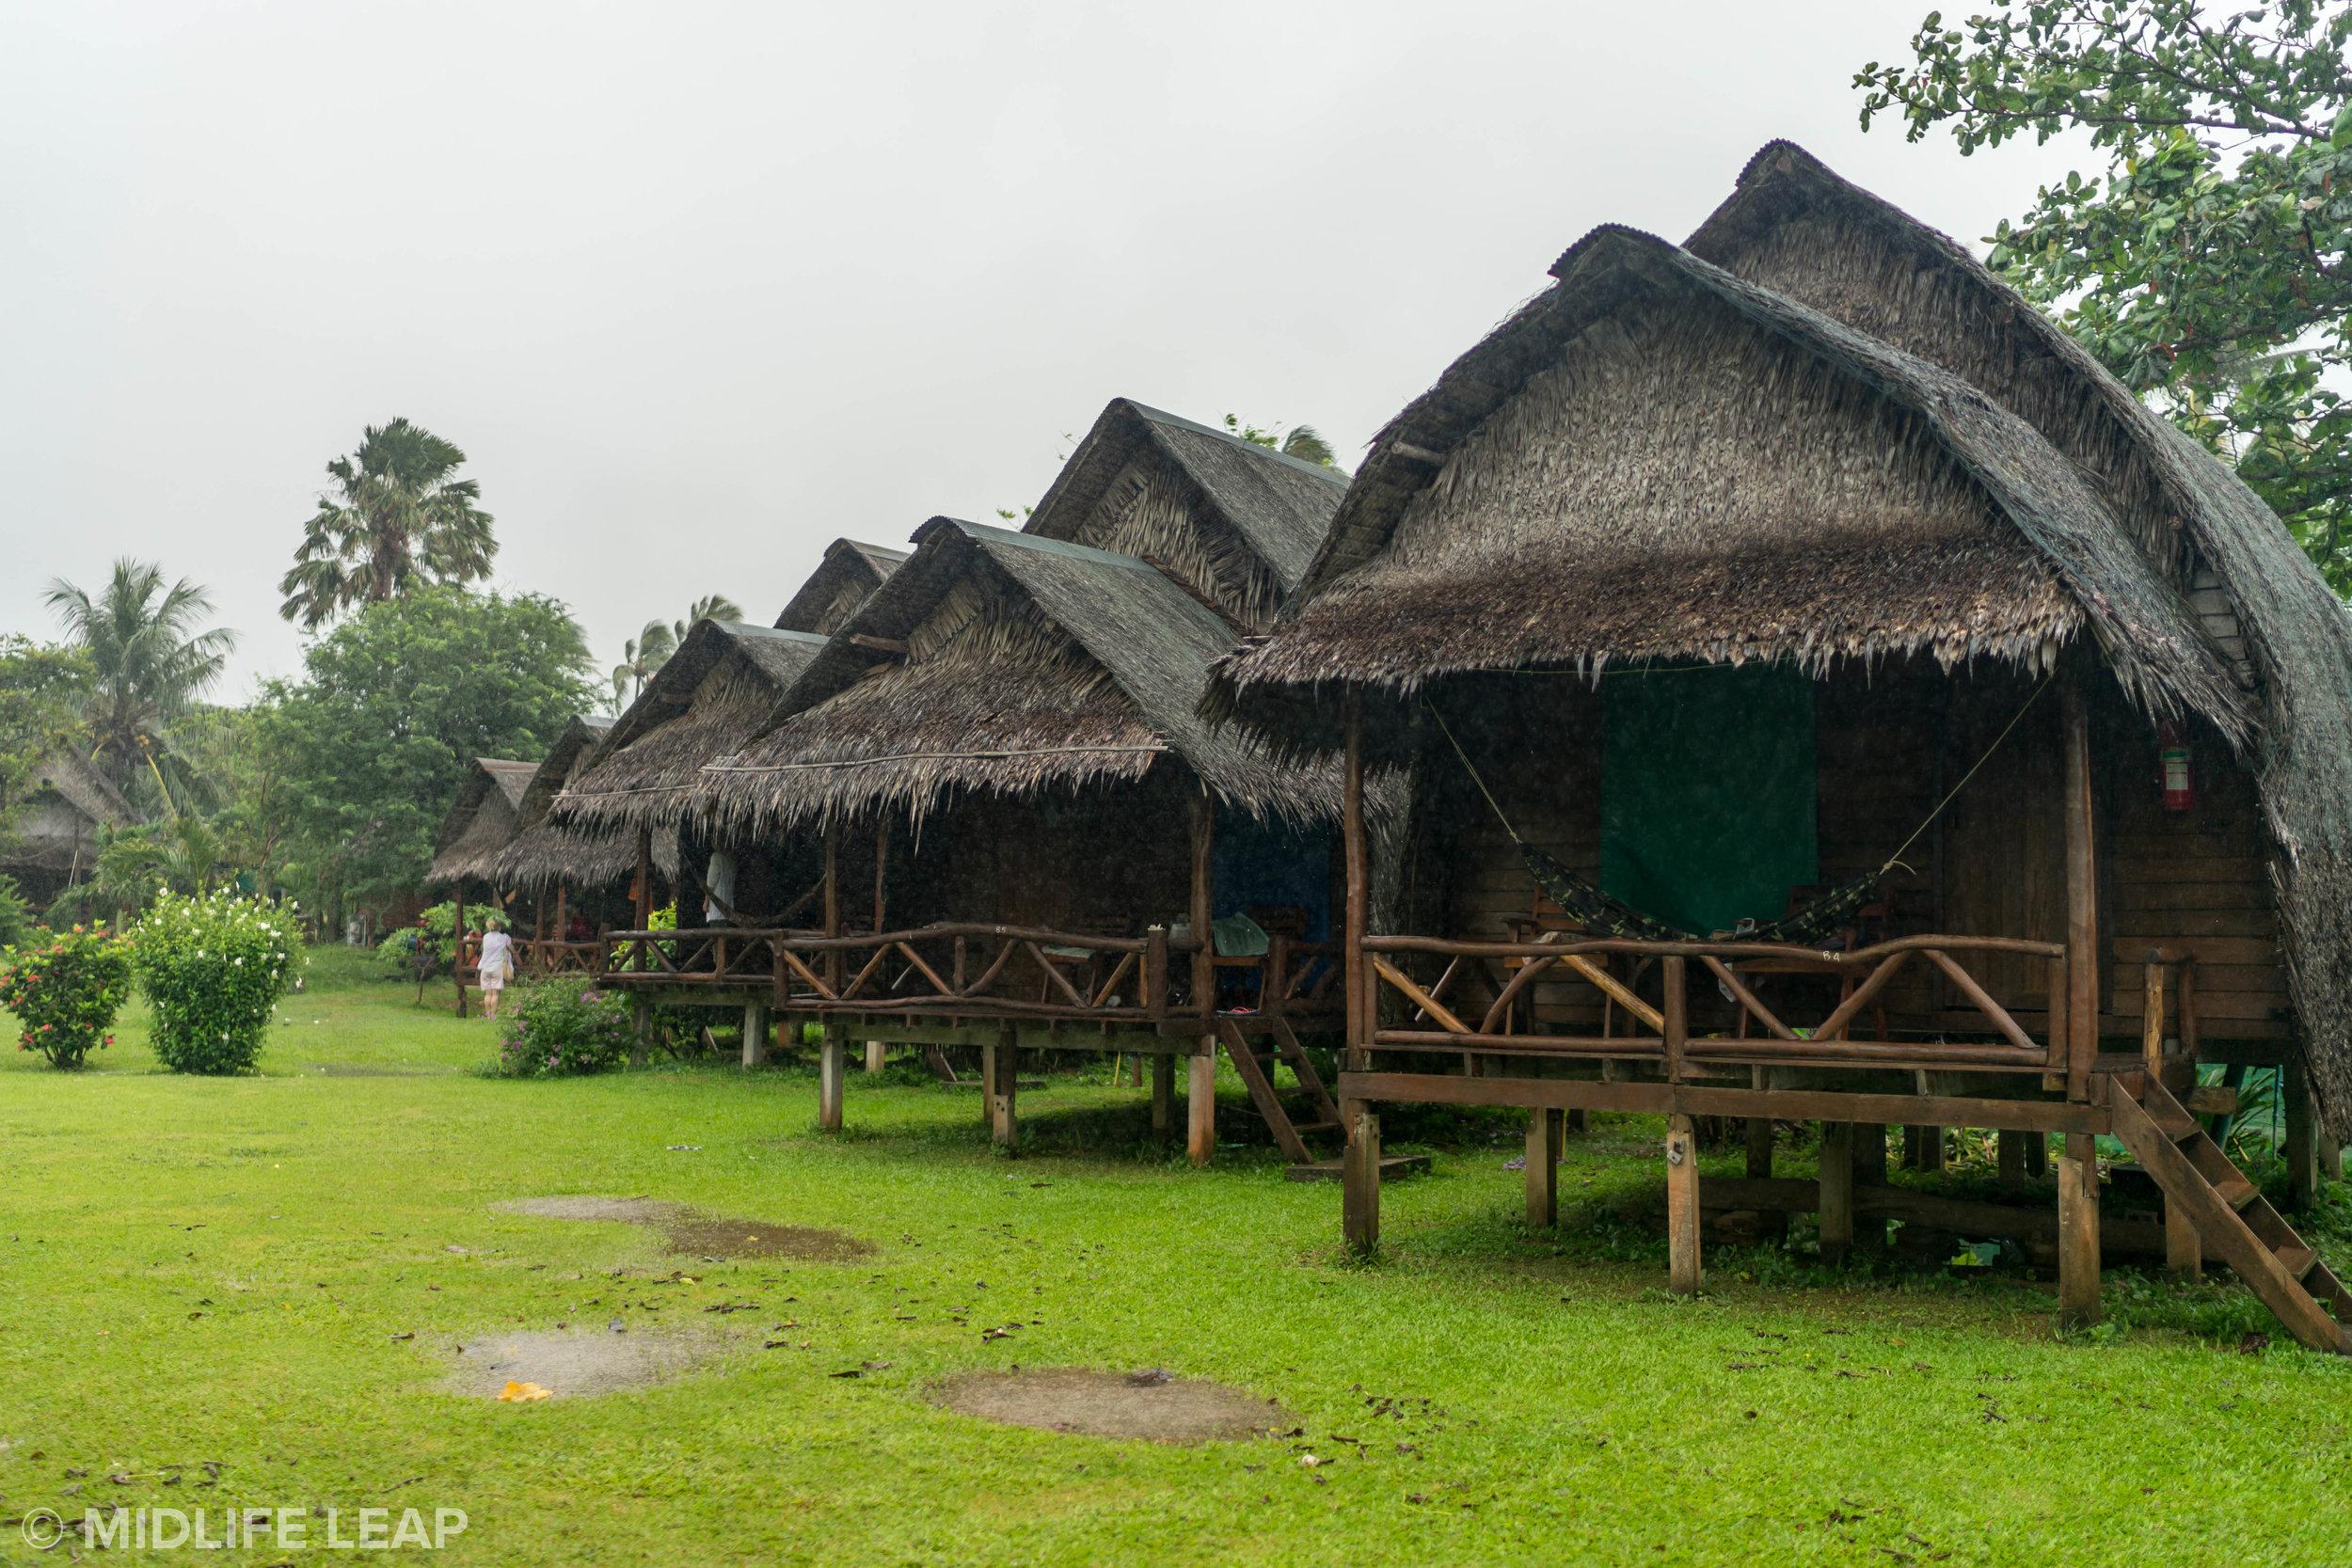 Our little bungalow